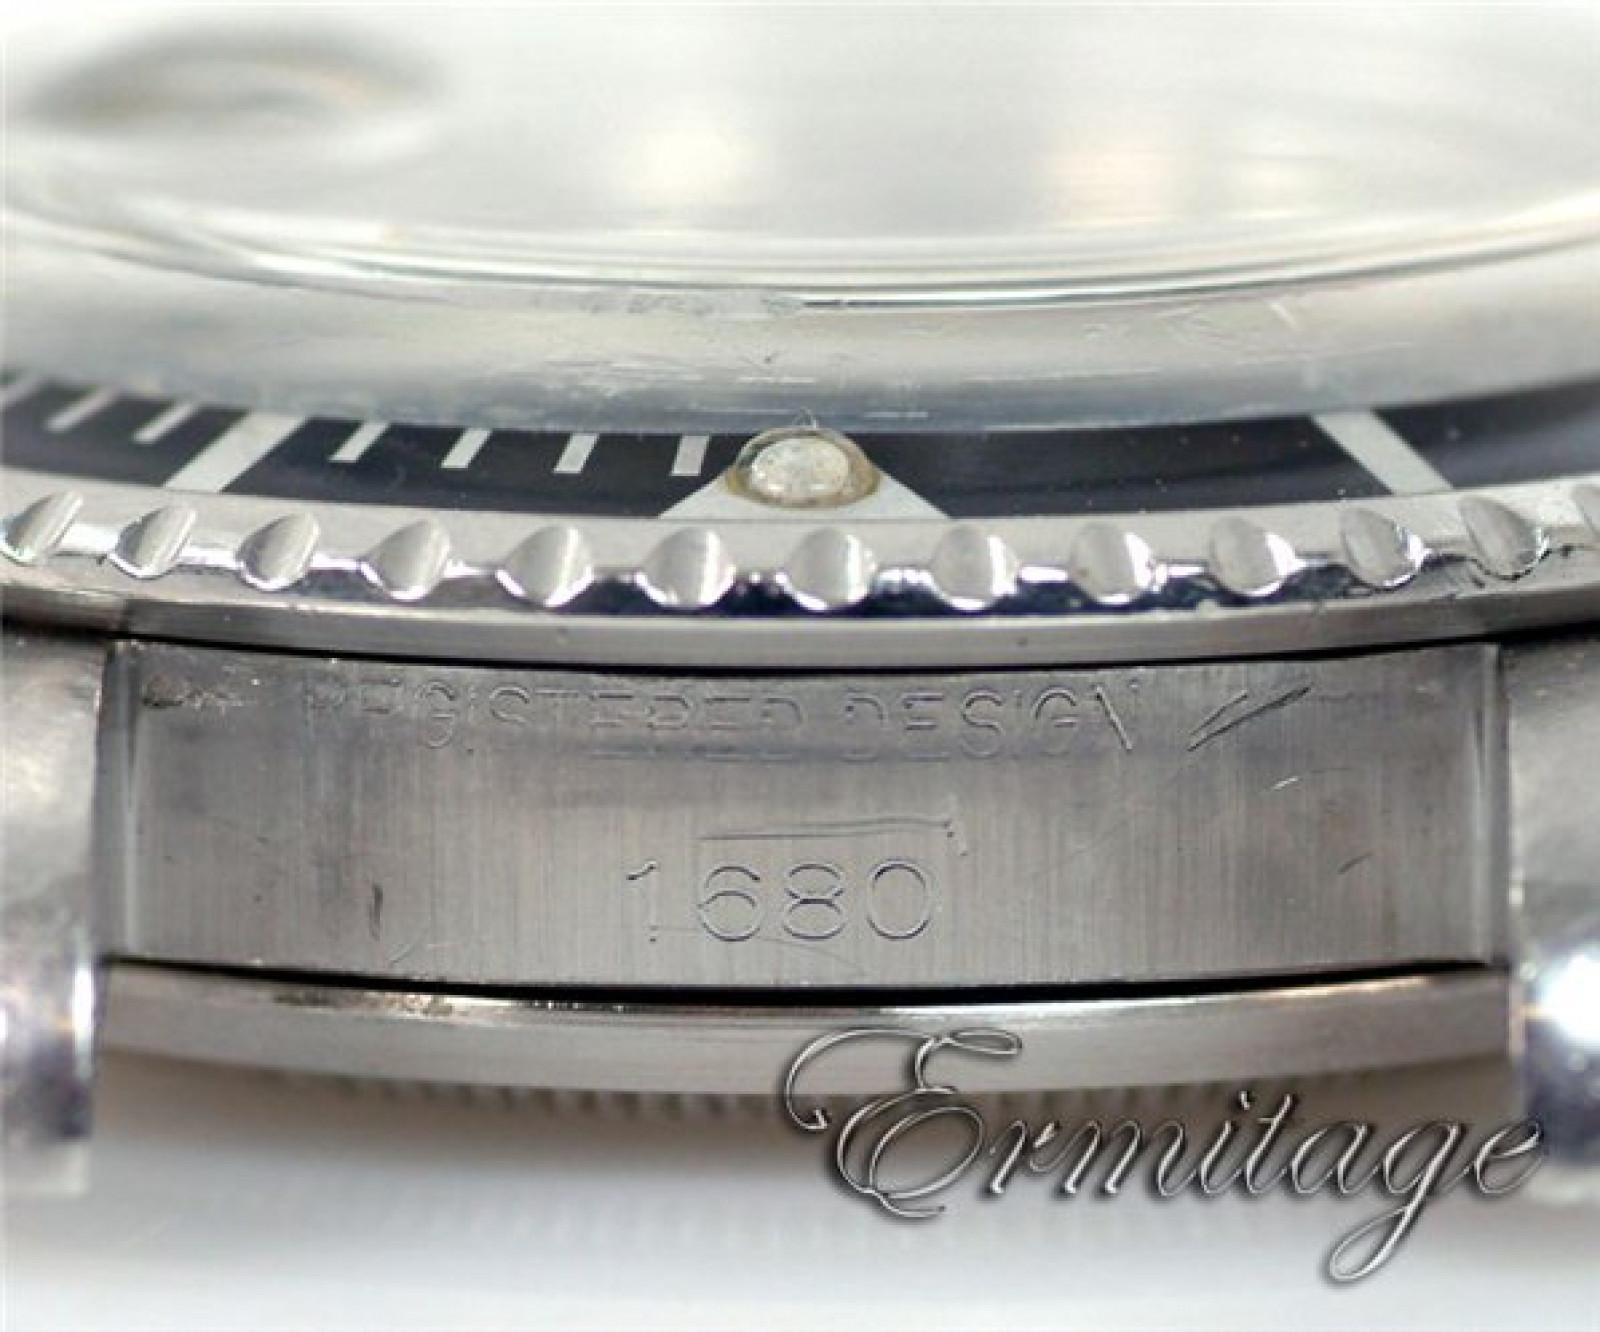 Rare Vintage Rolex Submariner 1680 Steel Mark I